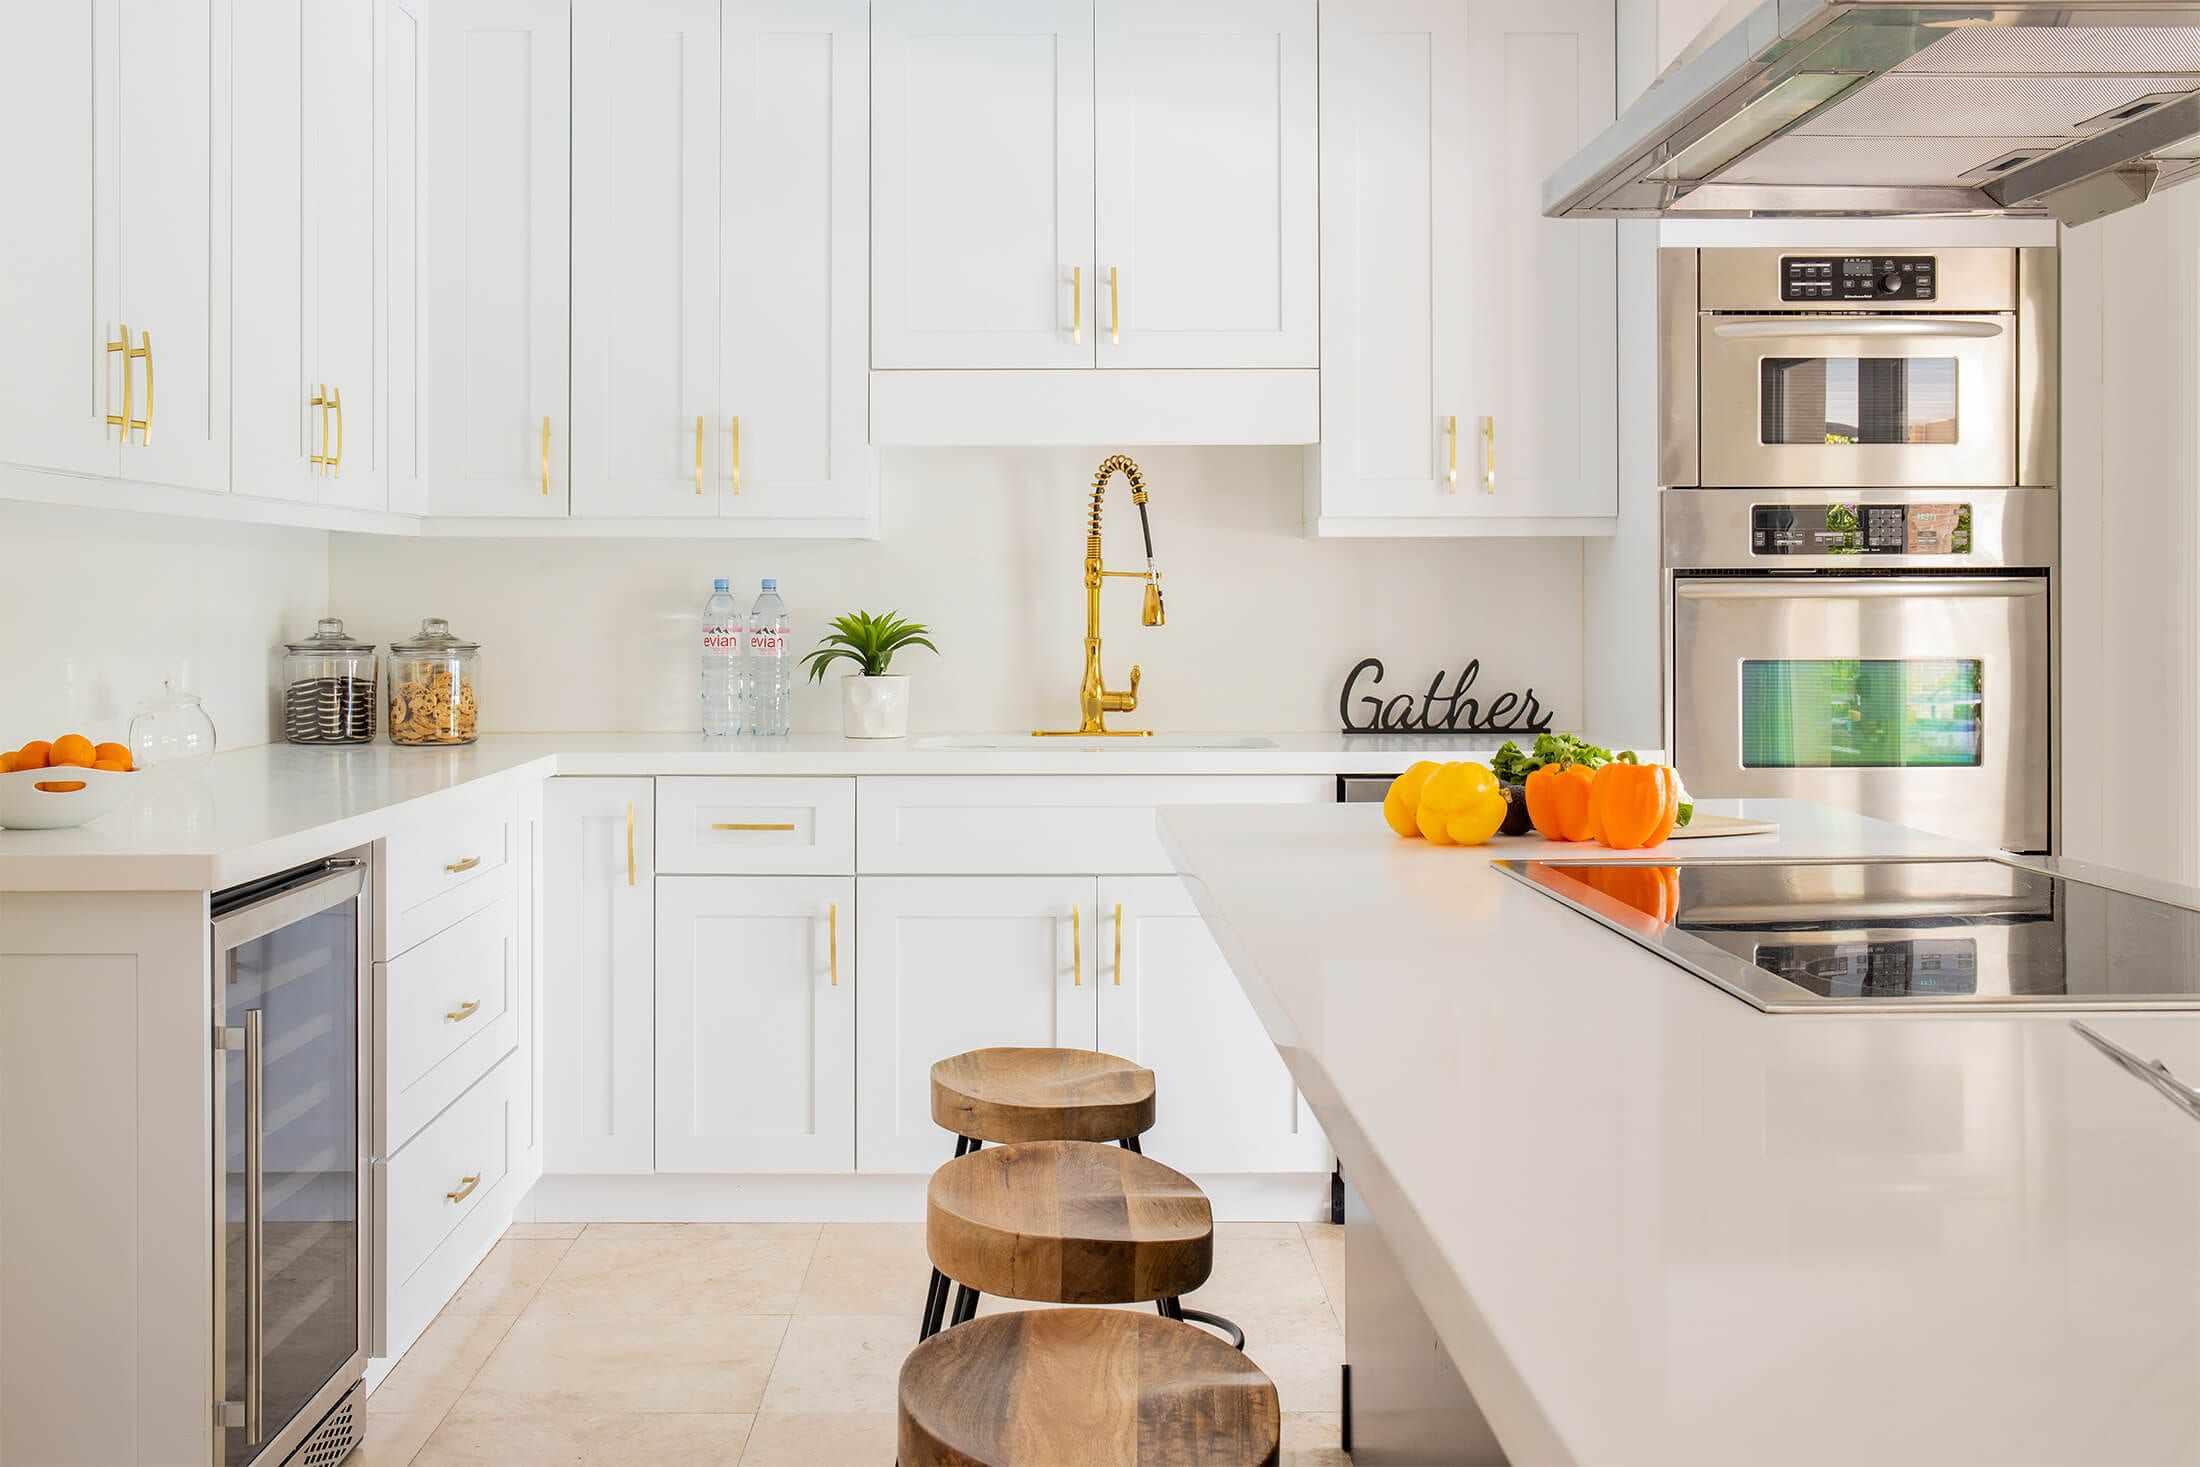 White kitchen laminate countertops